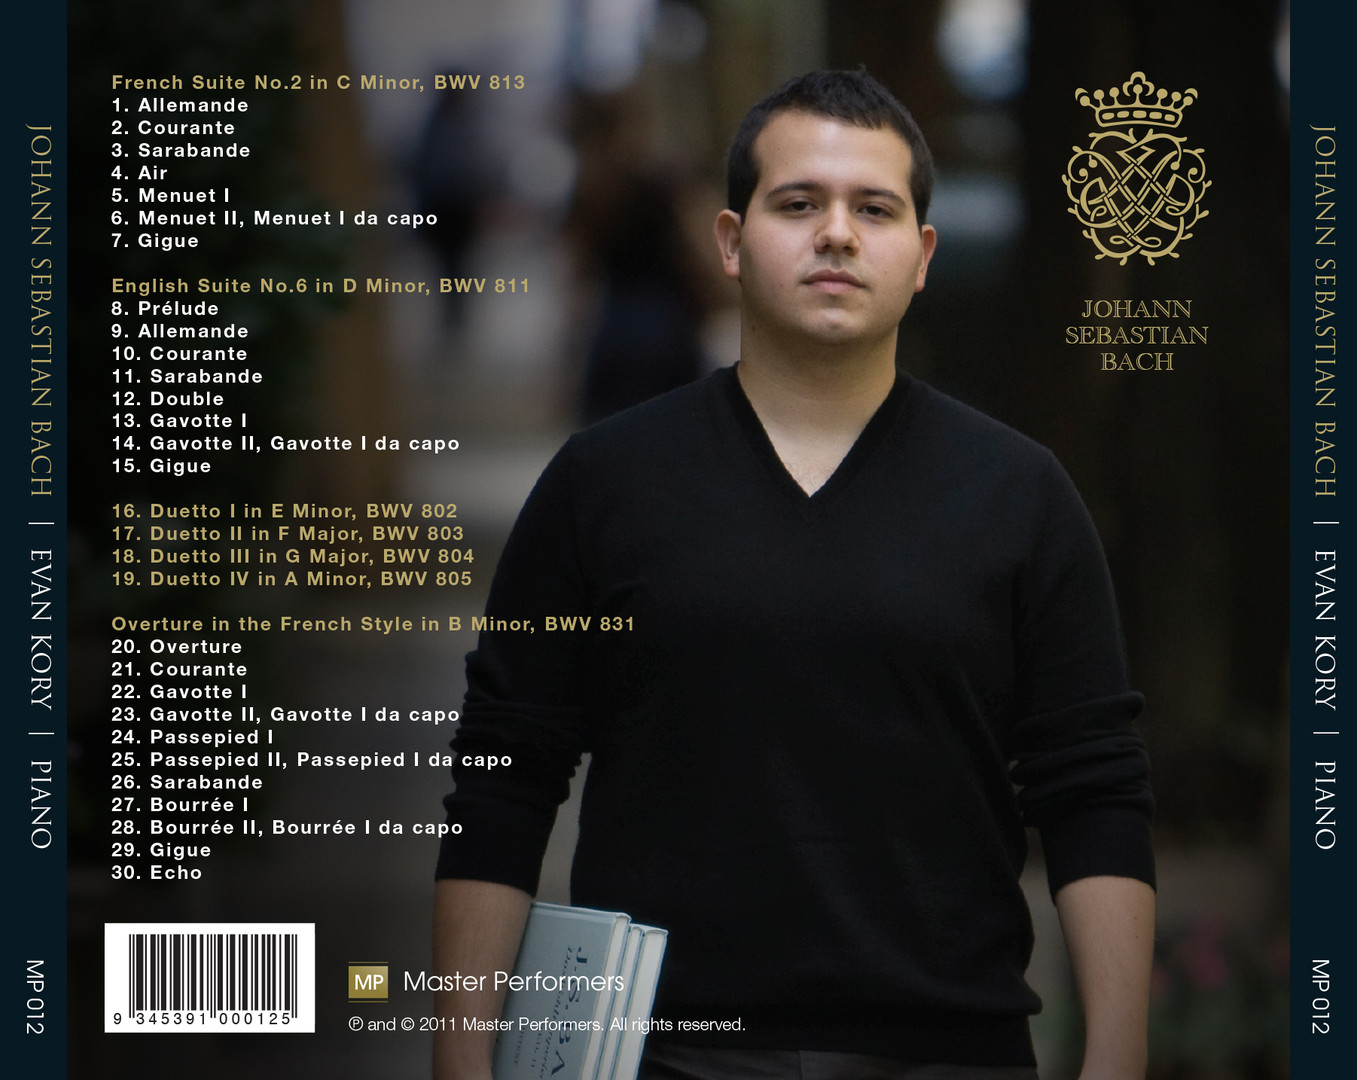 Evan Kory J.S. Bach CD Tray